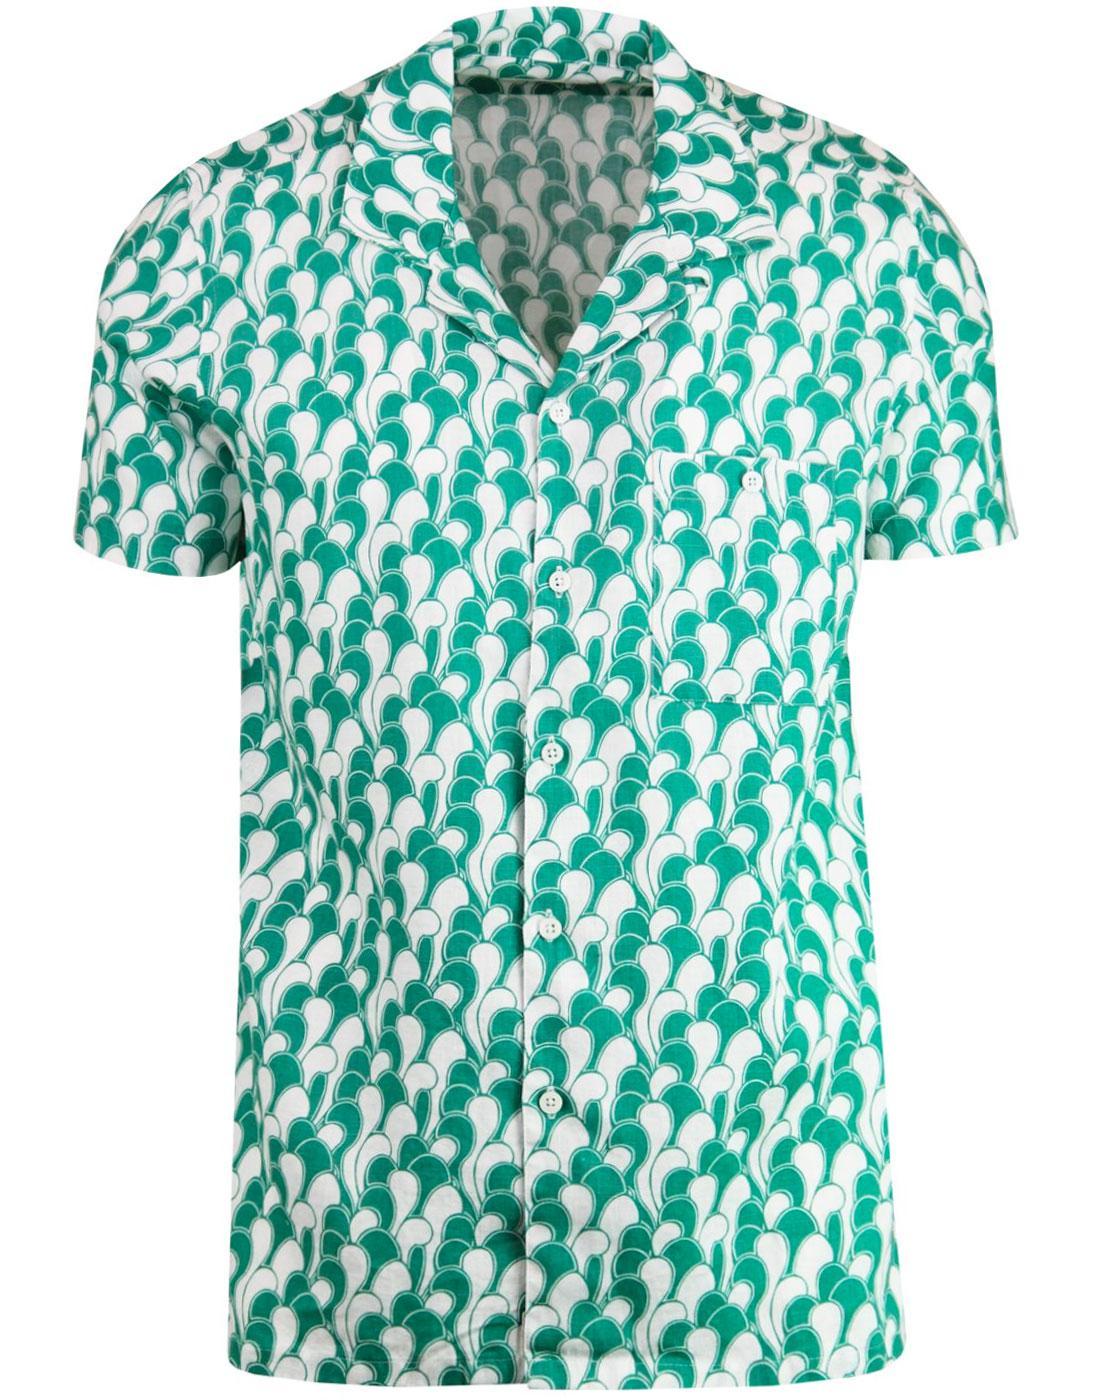 Selleck AFIELD Retro 70s Cine Waves Hawaiian Shirt